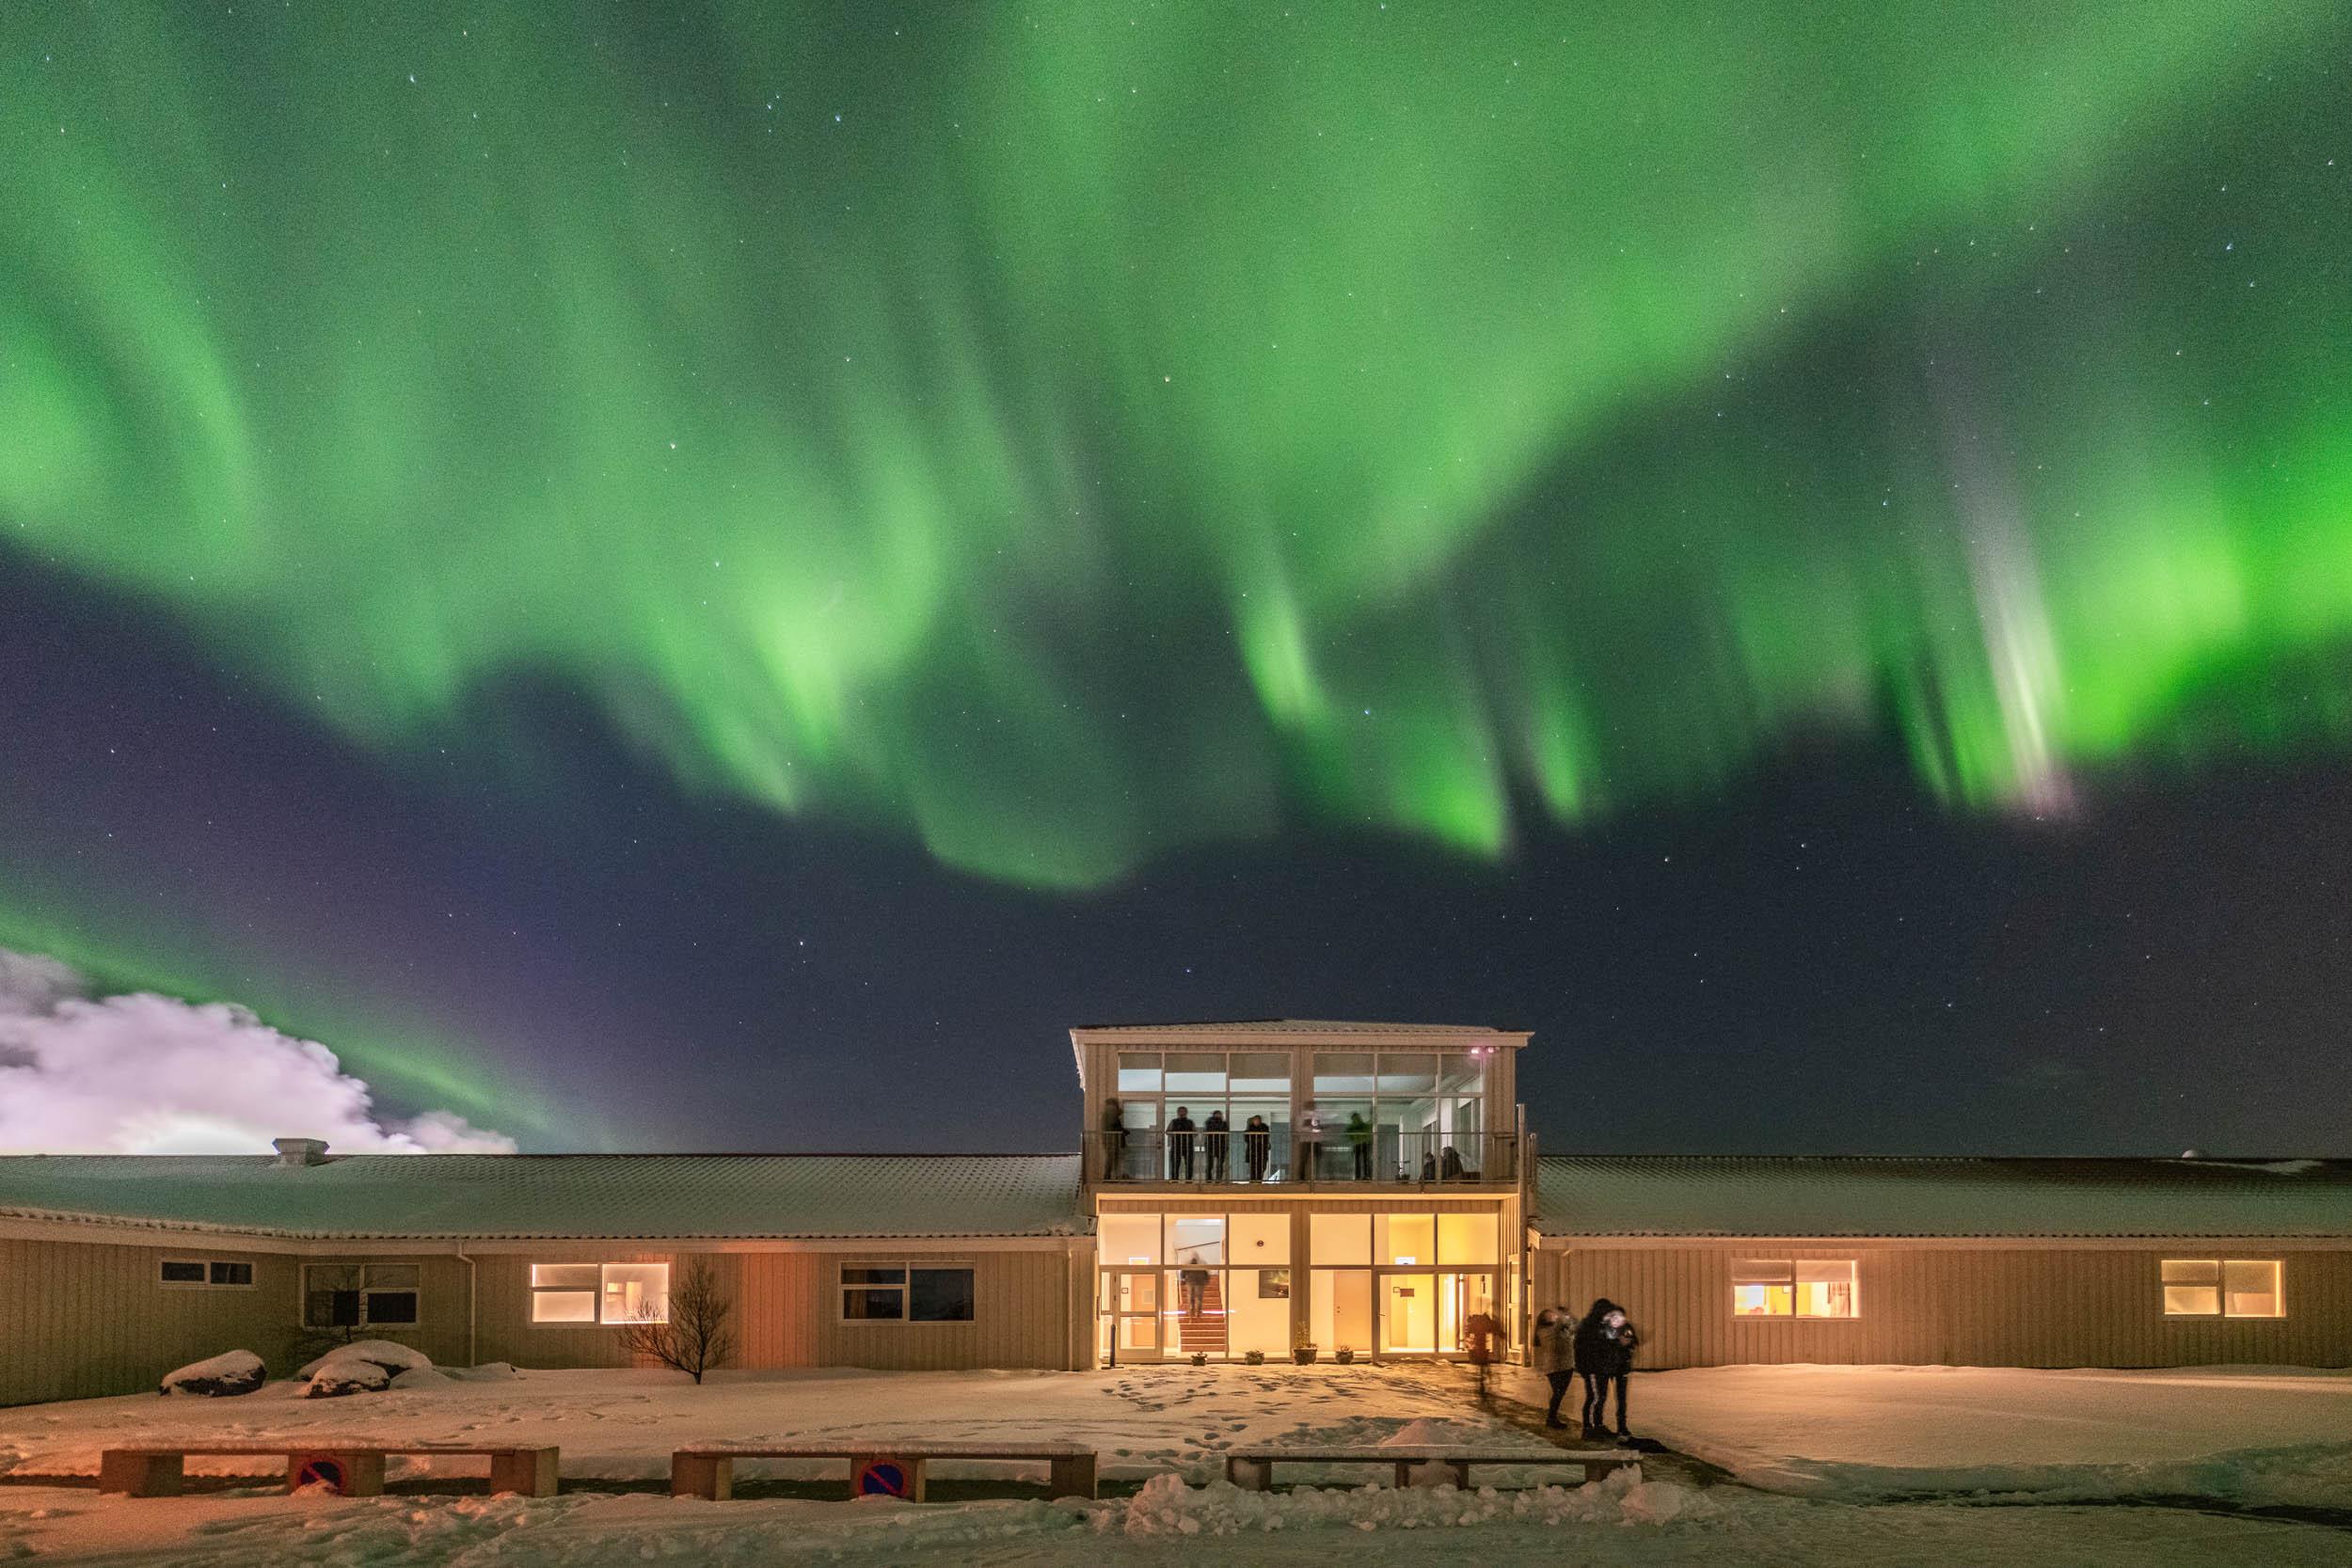 Aurora Borealis aboveNorthern Light Inn's Galaxy Tower.